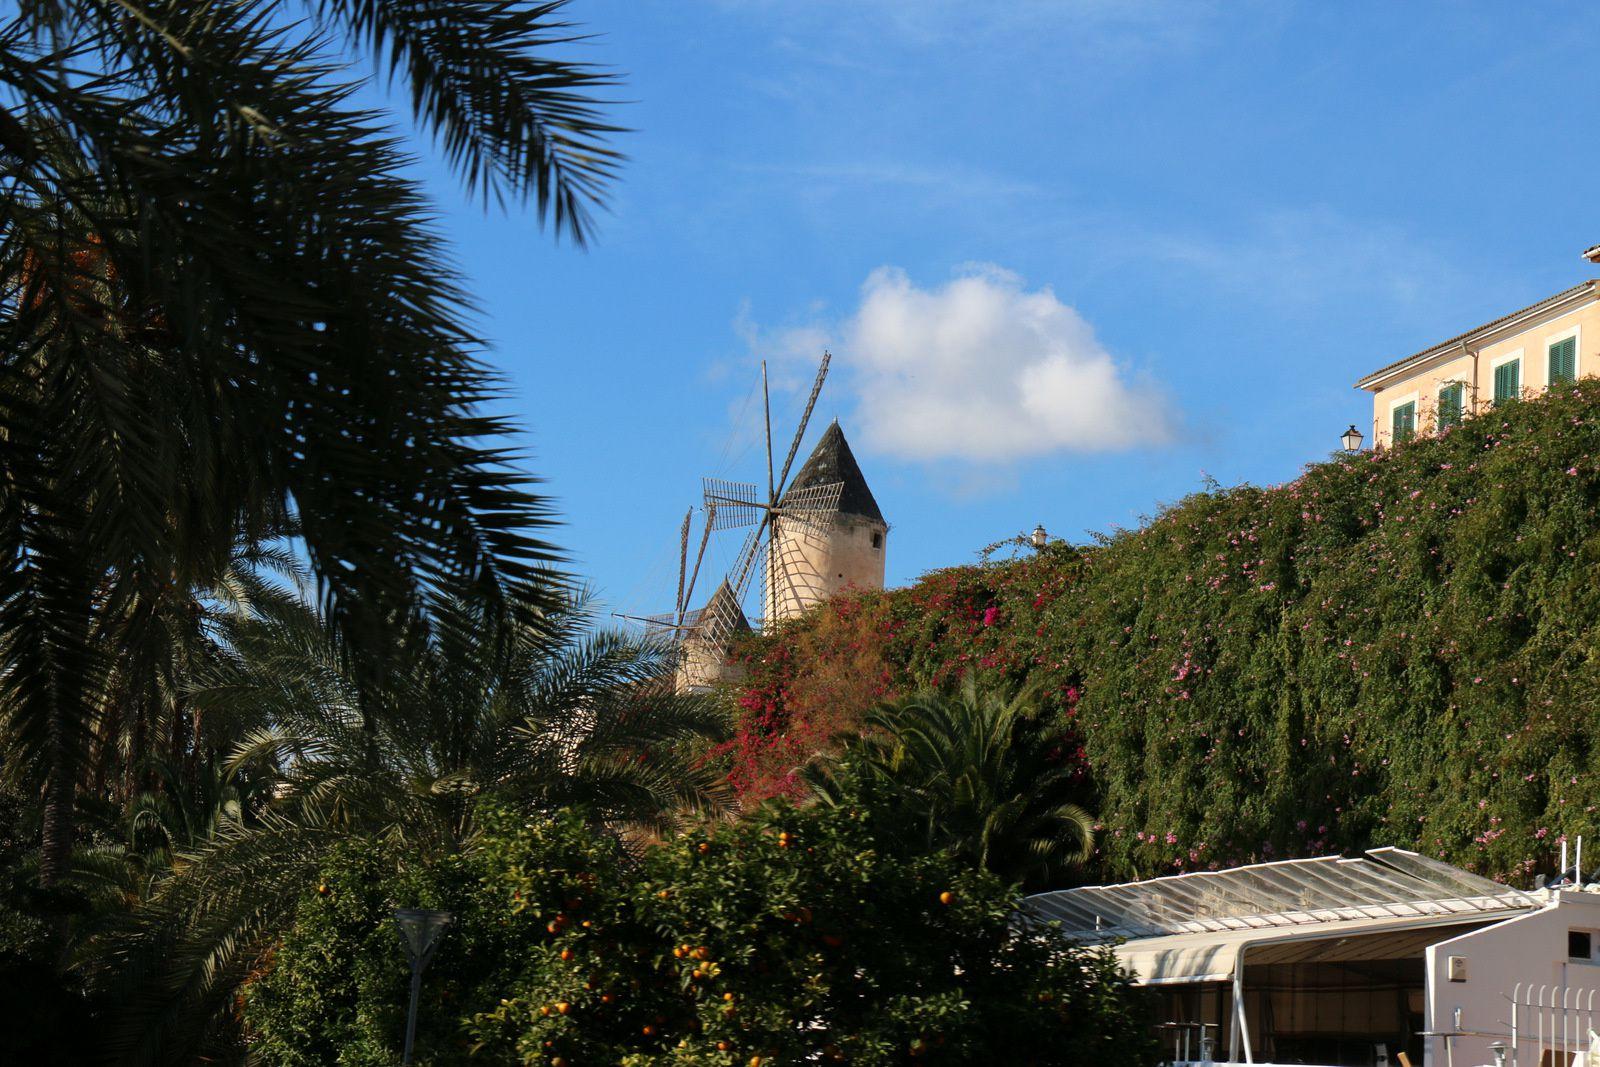 Ramon Llull et moulins